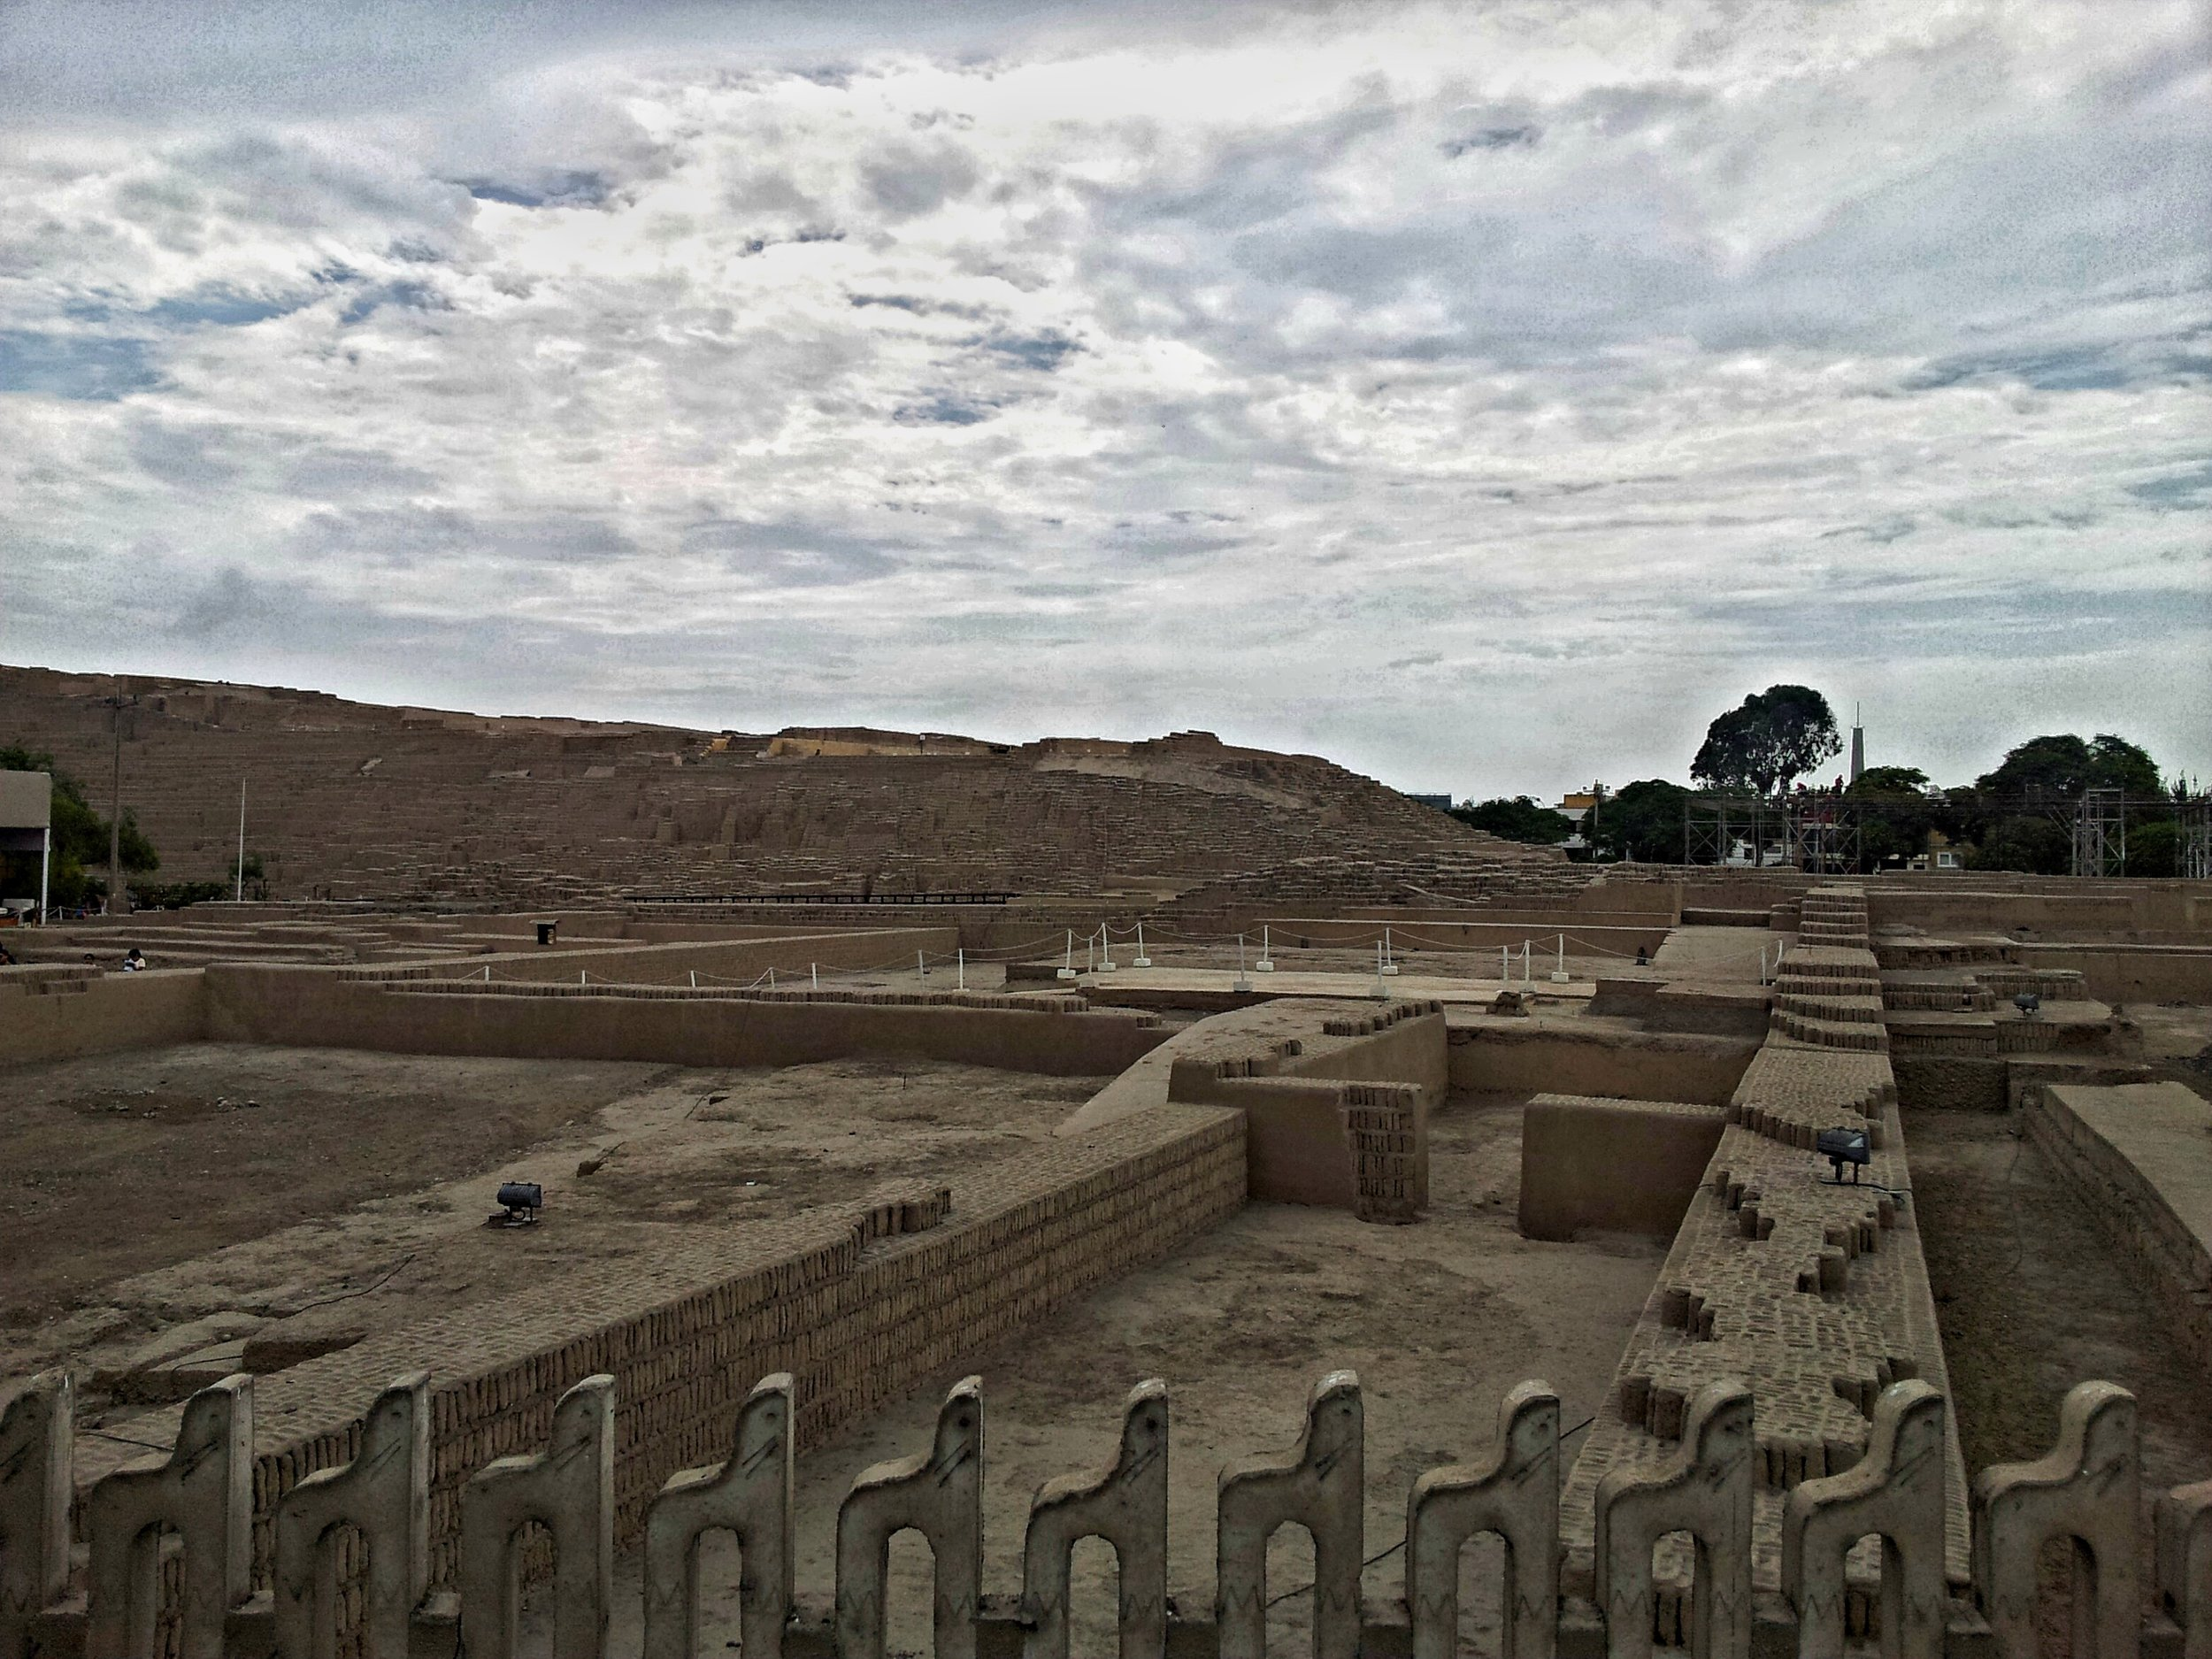 Travel Guide to Peru: Huaca Pucllana